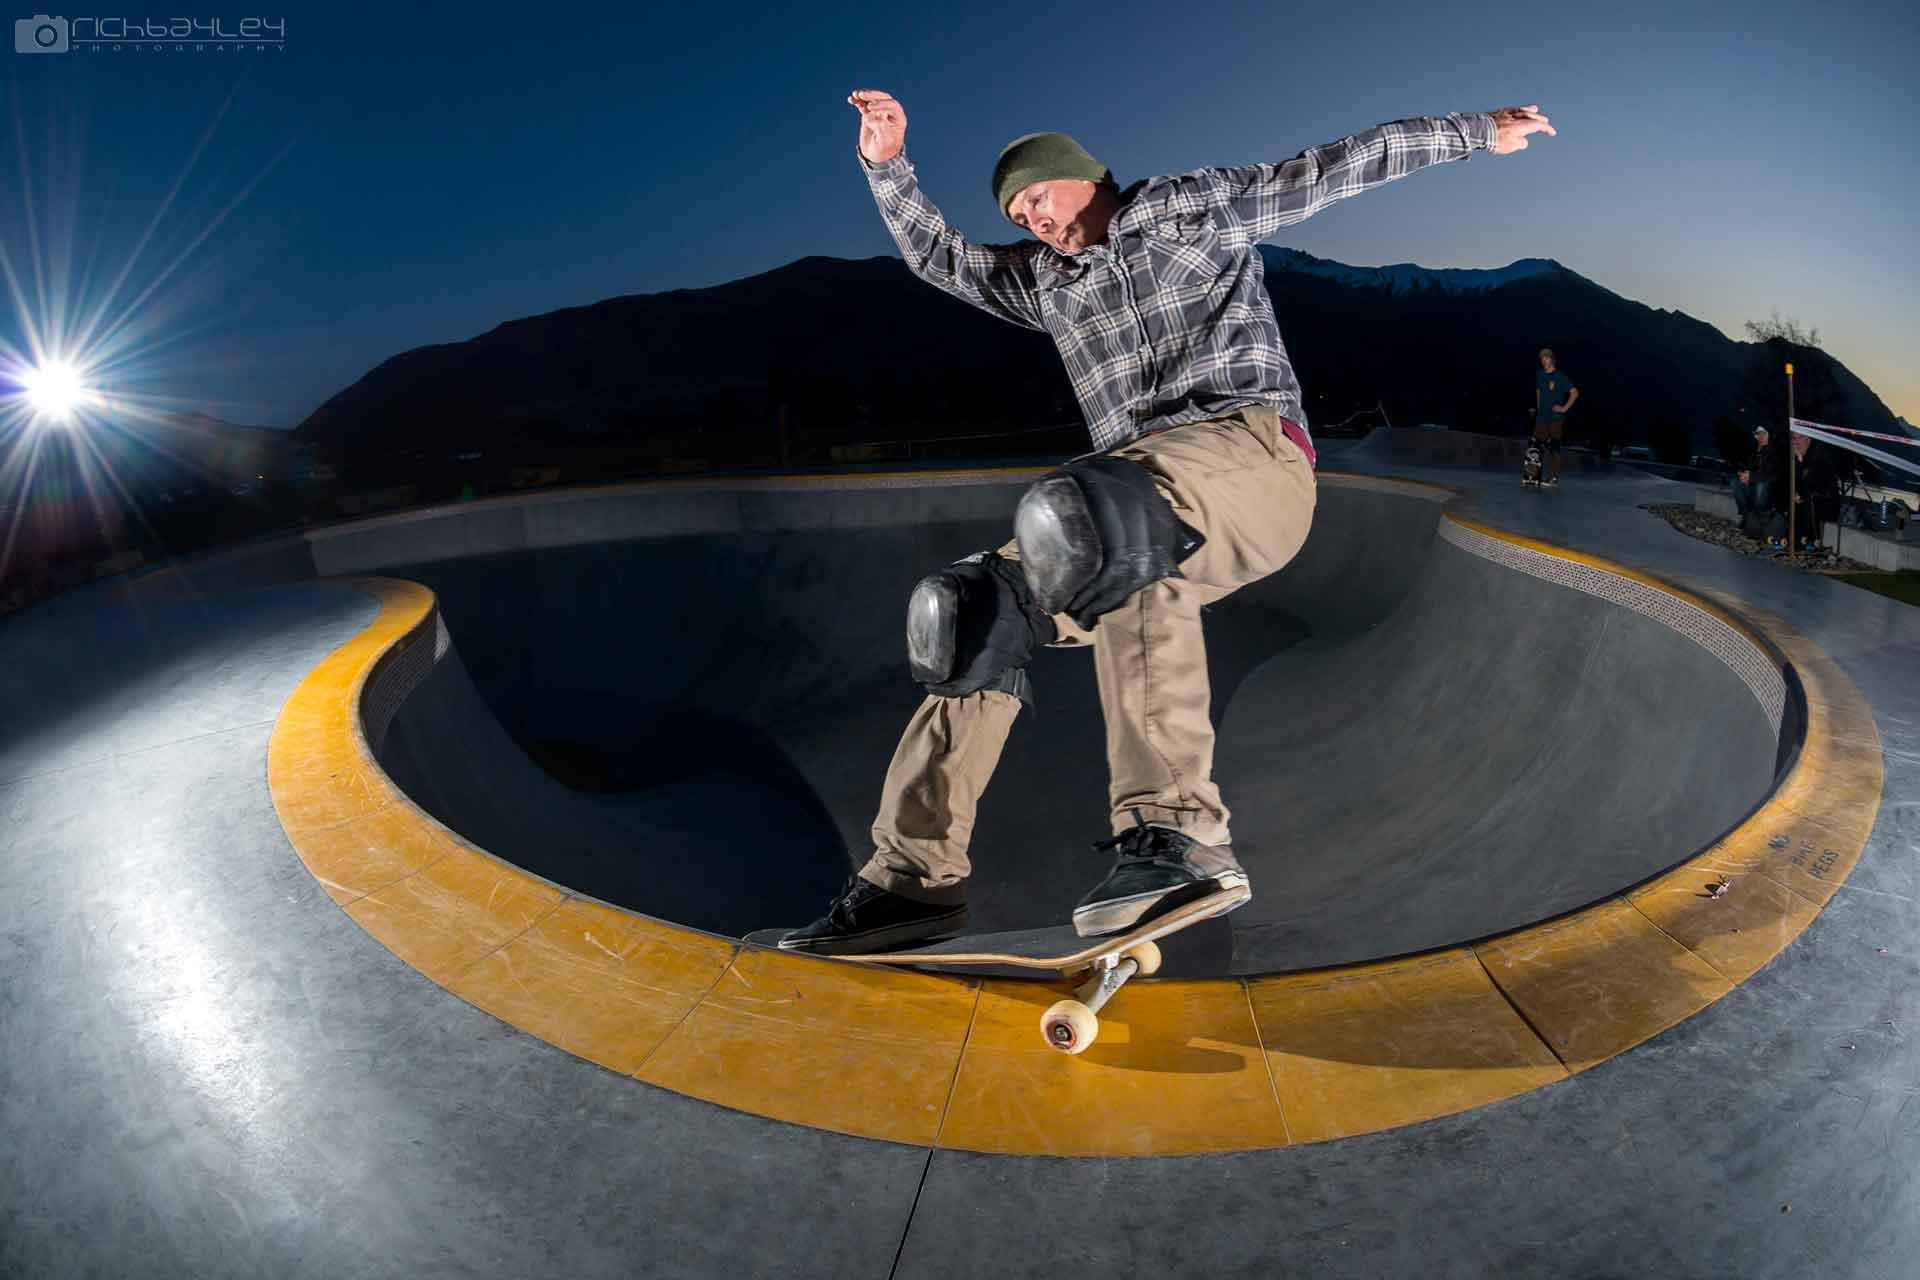 Premium Skate Designs - Jason Parkes - Smith Grind